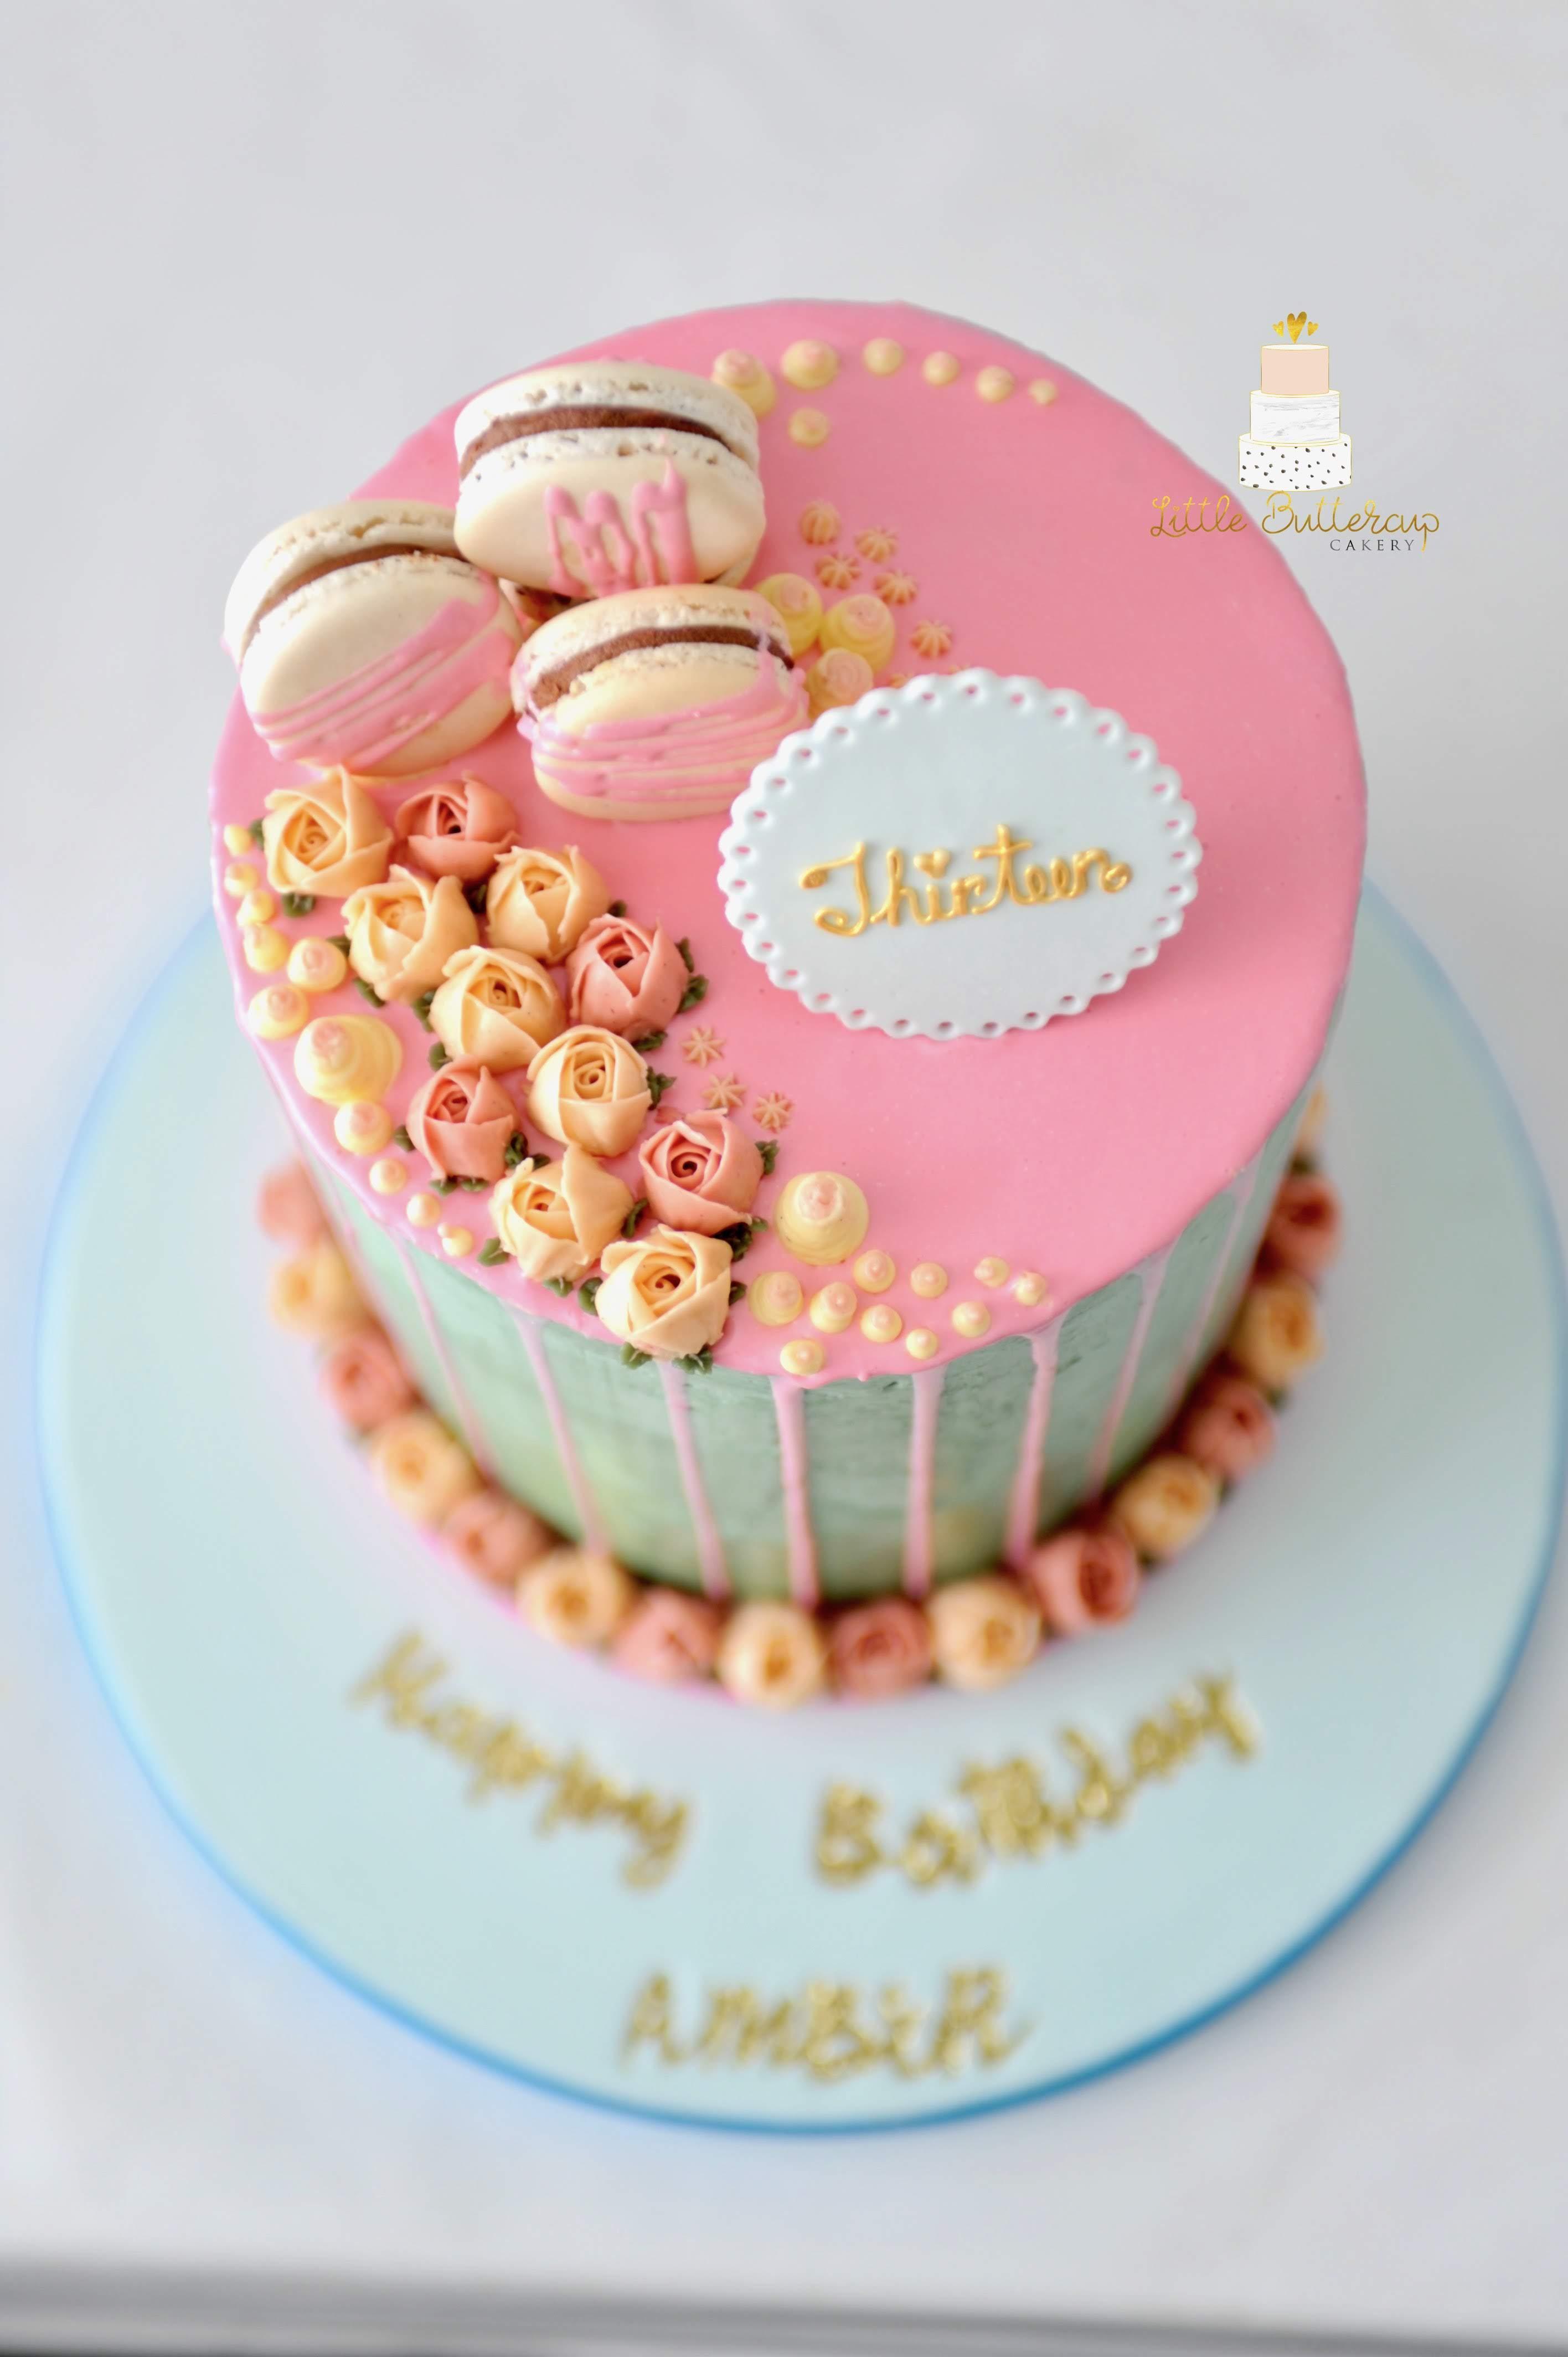 Piped buttercream cake